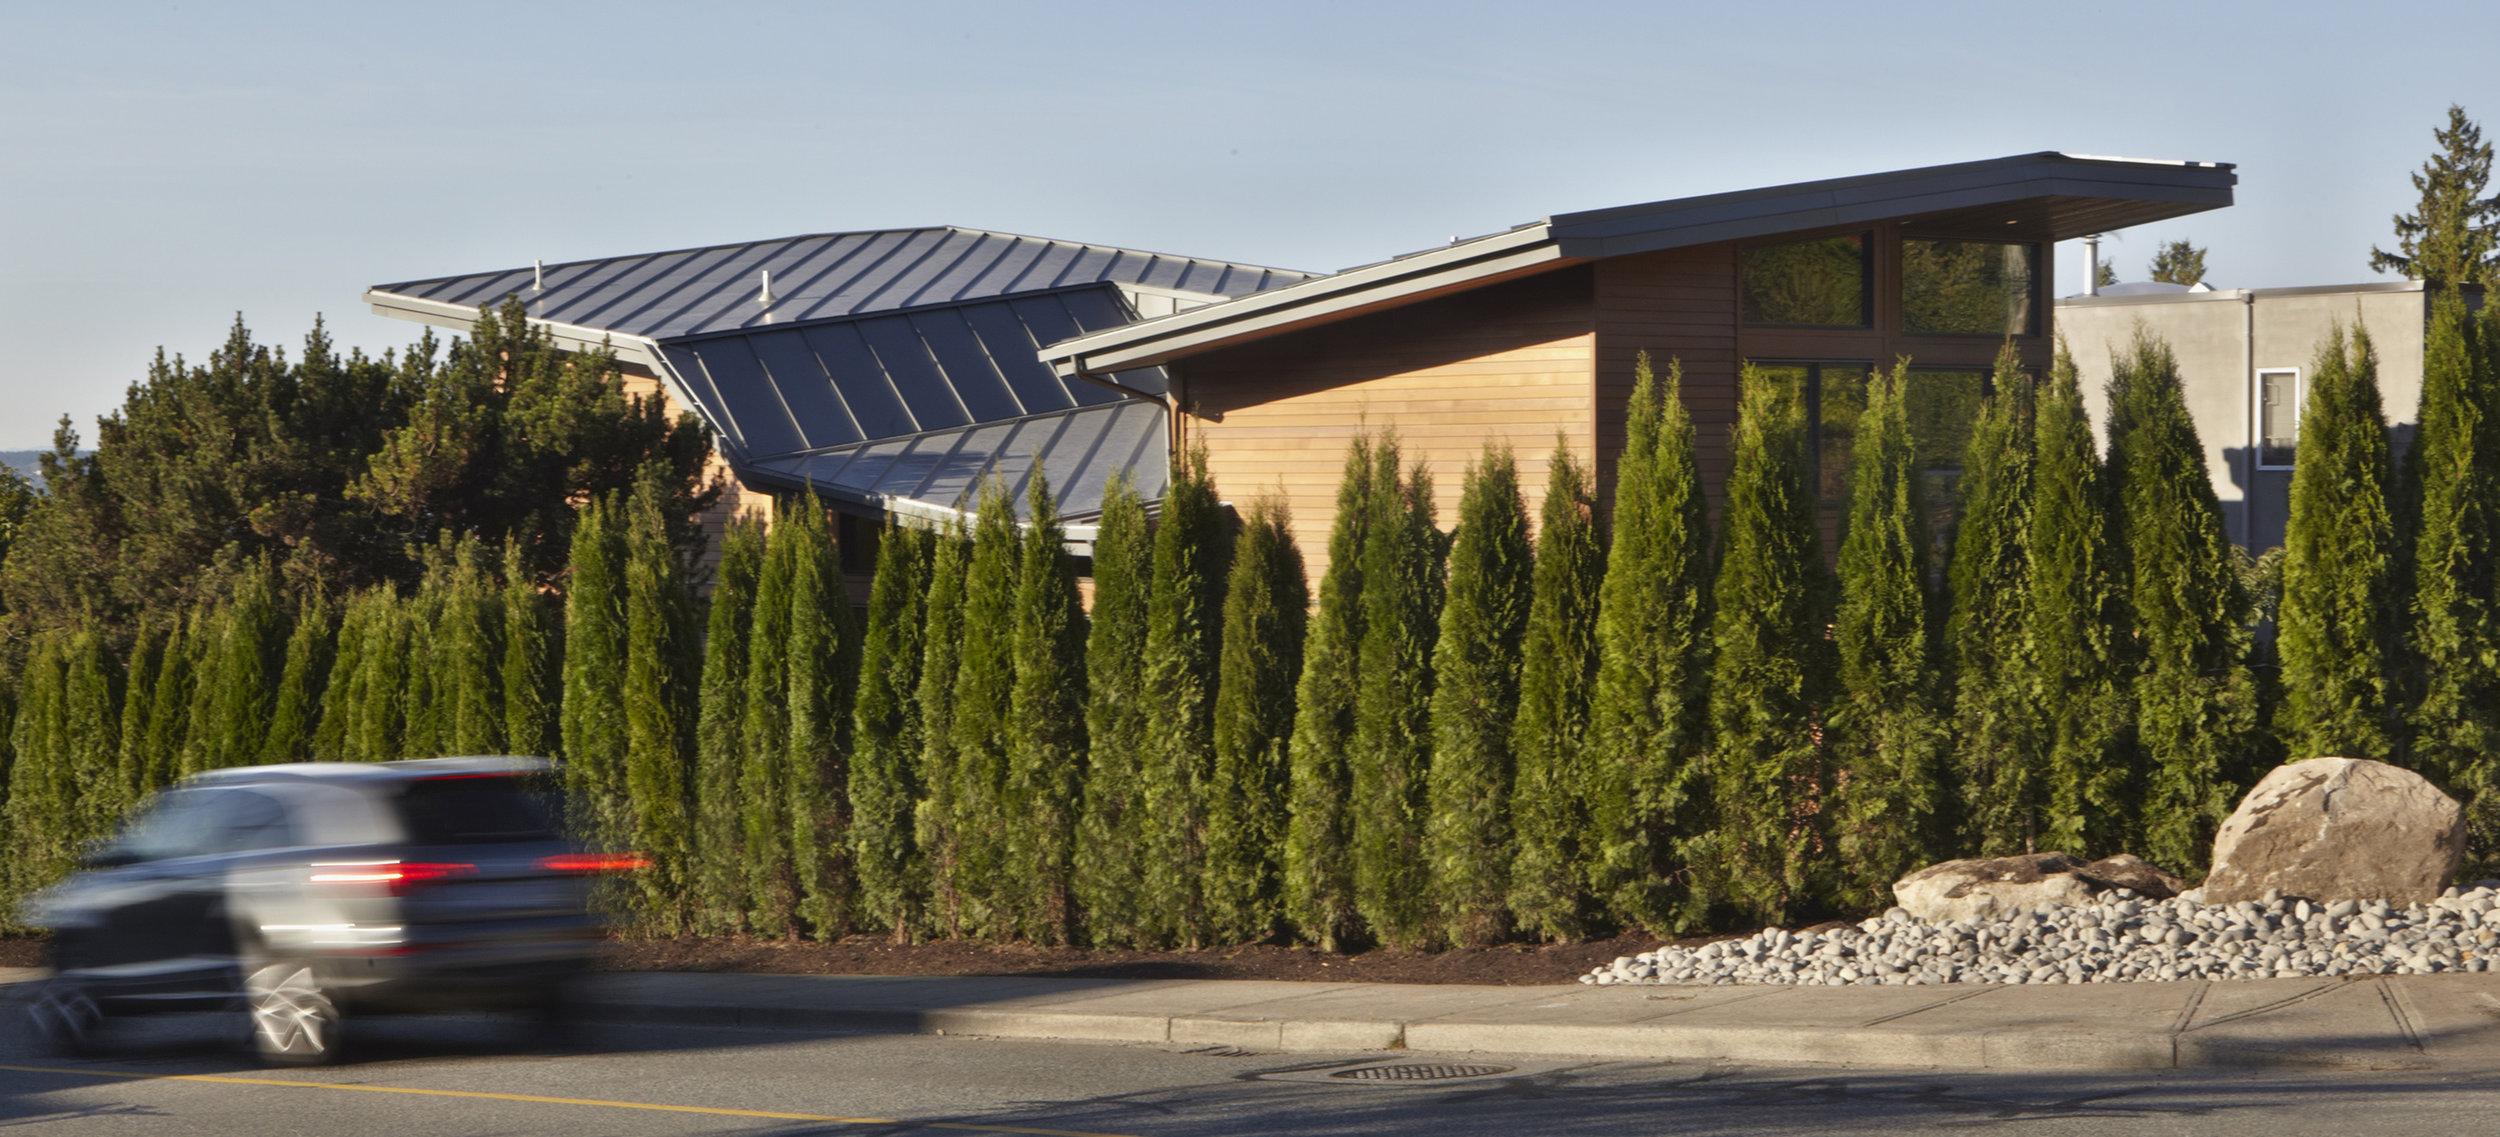 turkel_modern_design_prefab_home_west_vancouver_exterior_roof.jpg